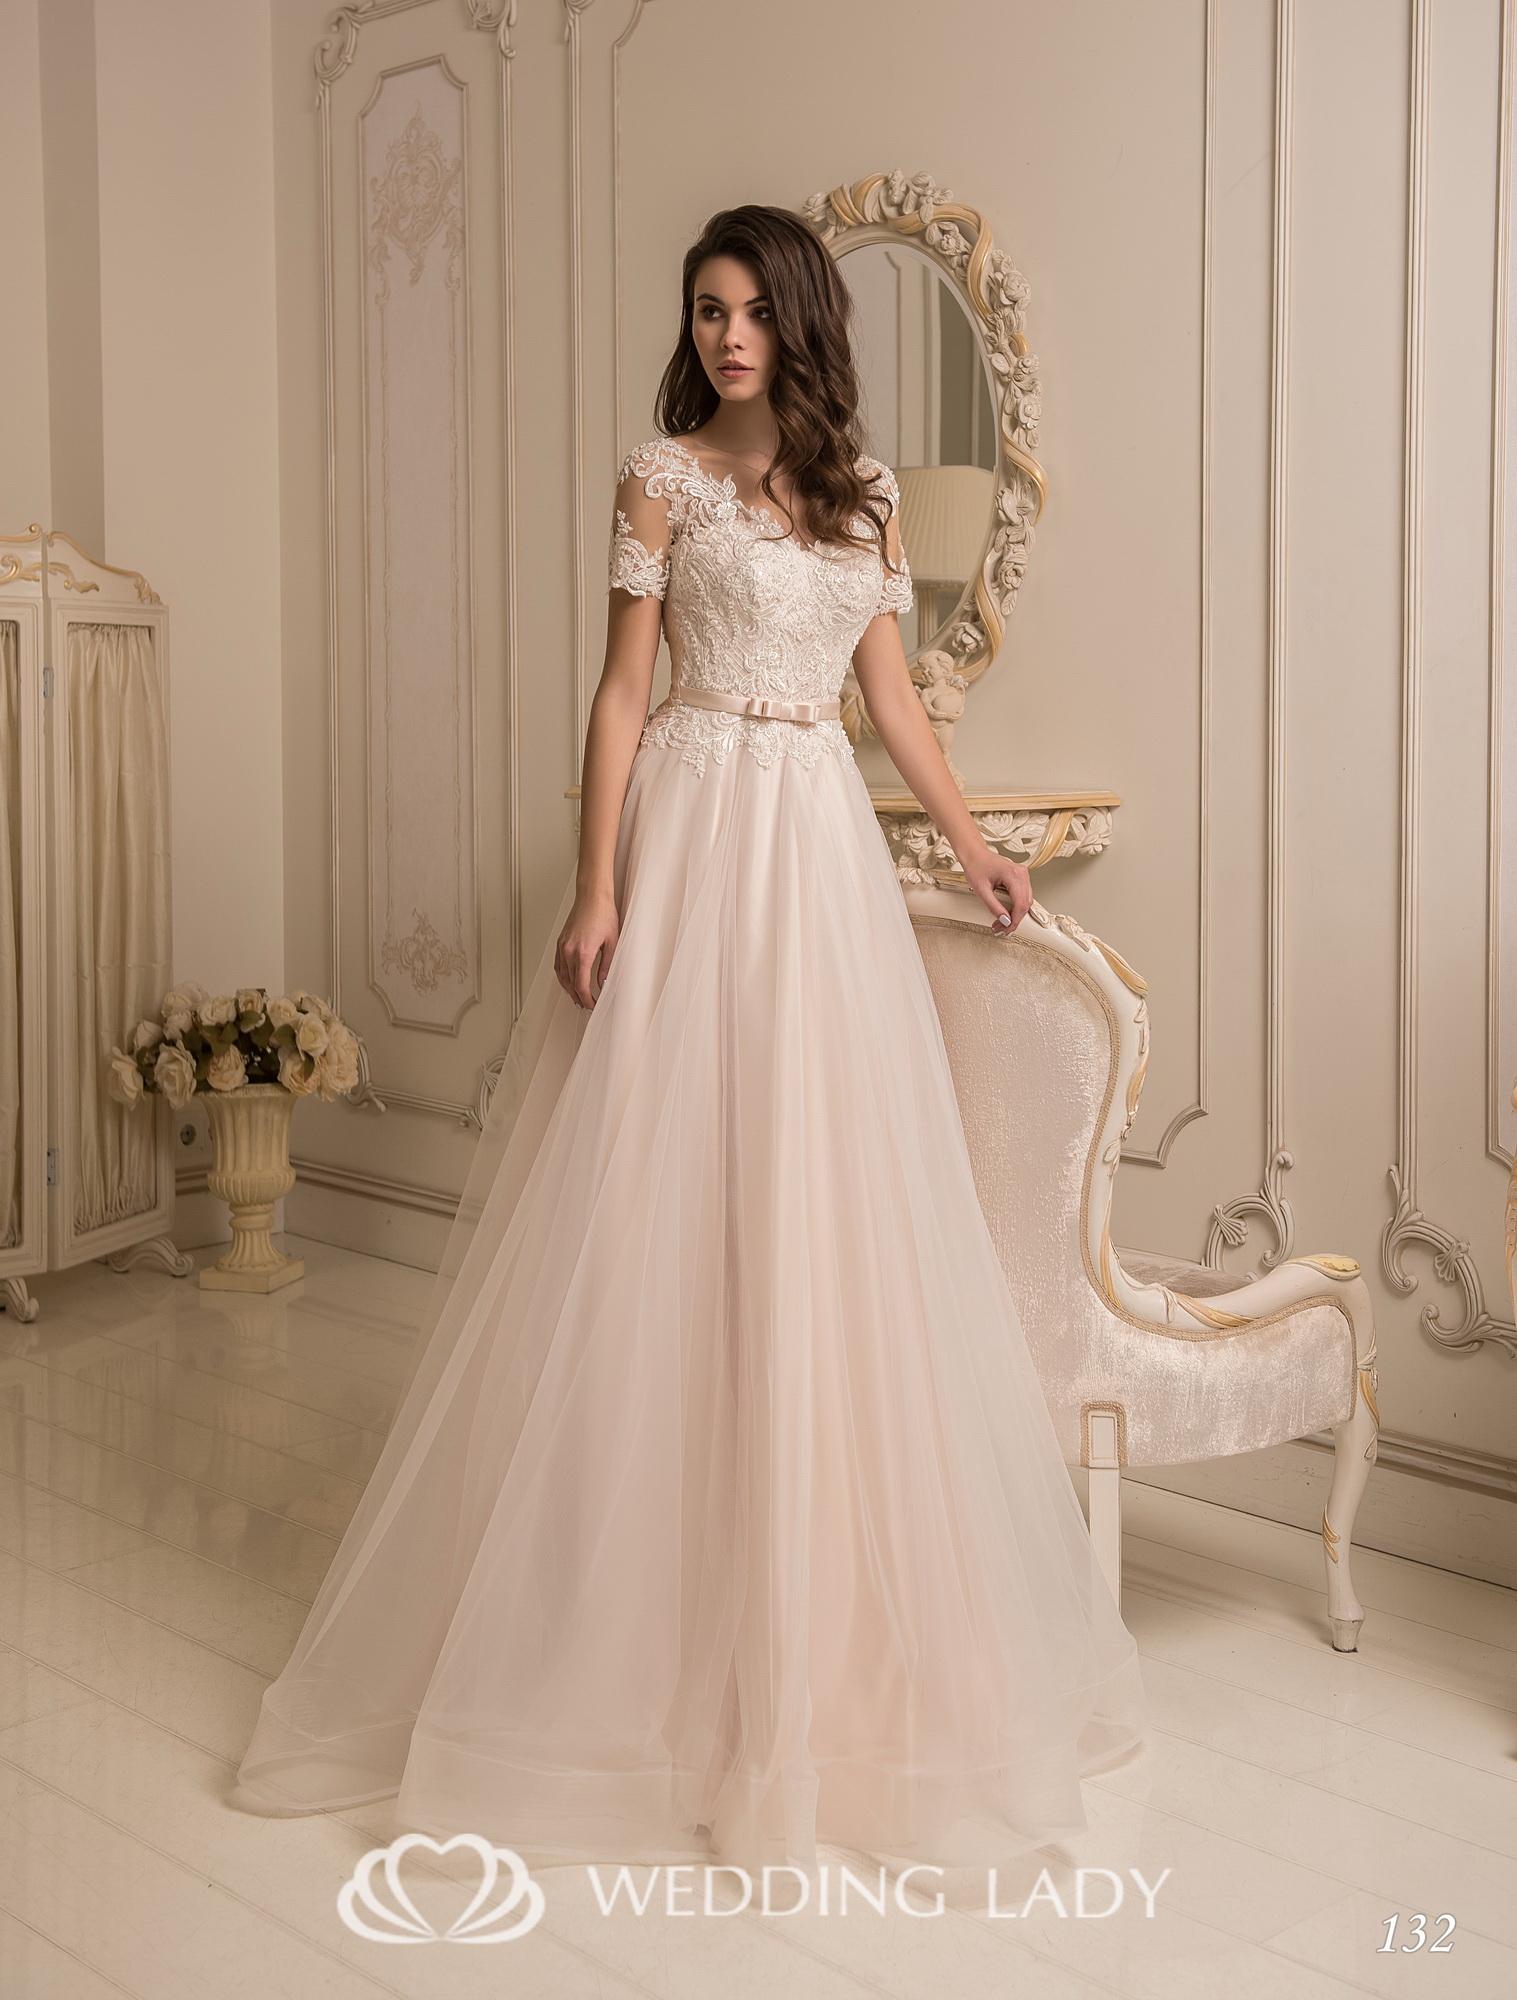 https://wedding-lady.com/images/stories/virtuemart/product/132-------(1).jpg